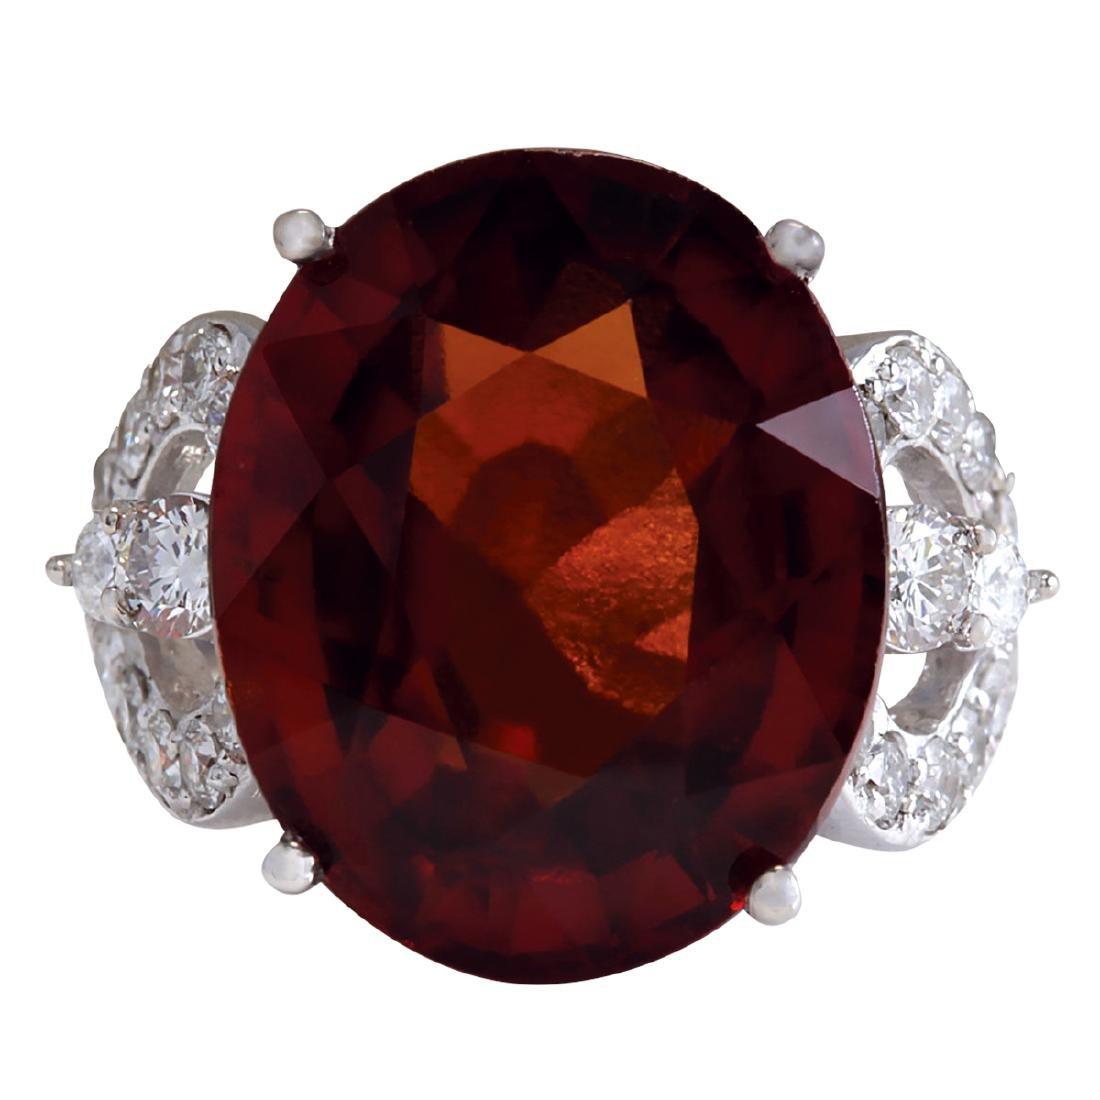 19.81Ct Natural Red Hessonite Garnet And Diamond Ring